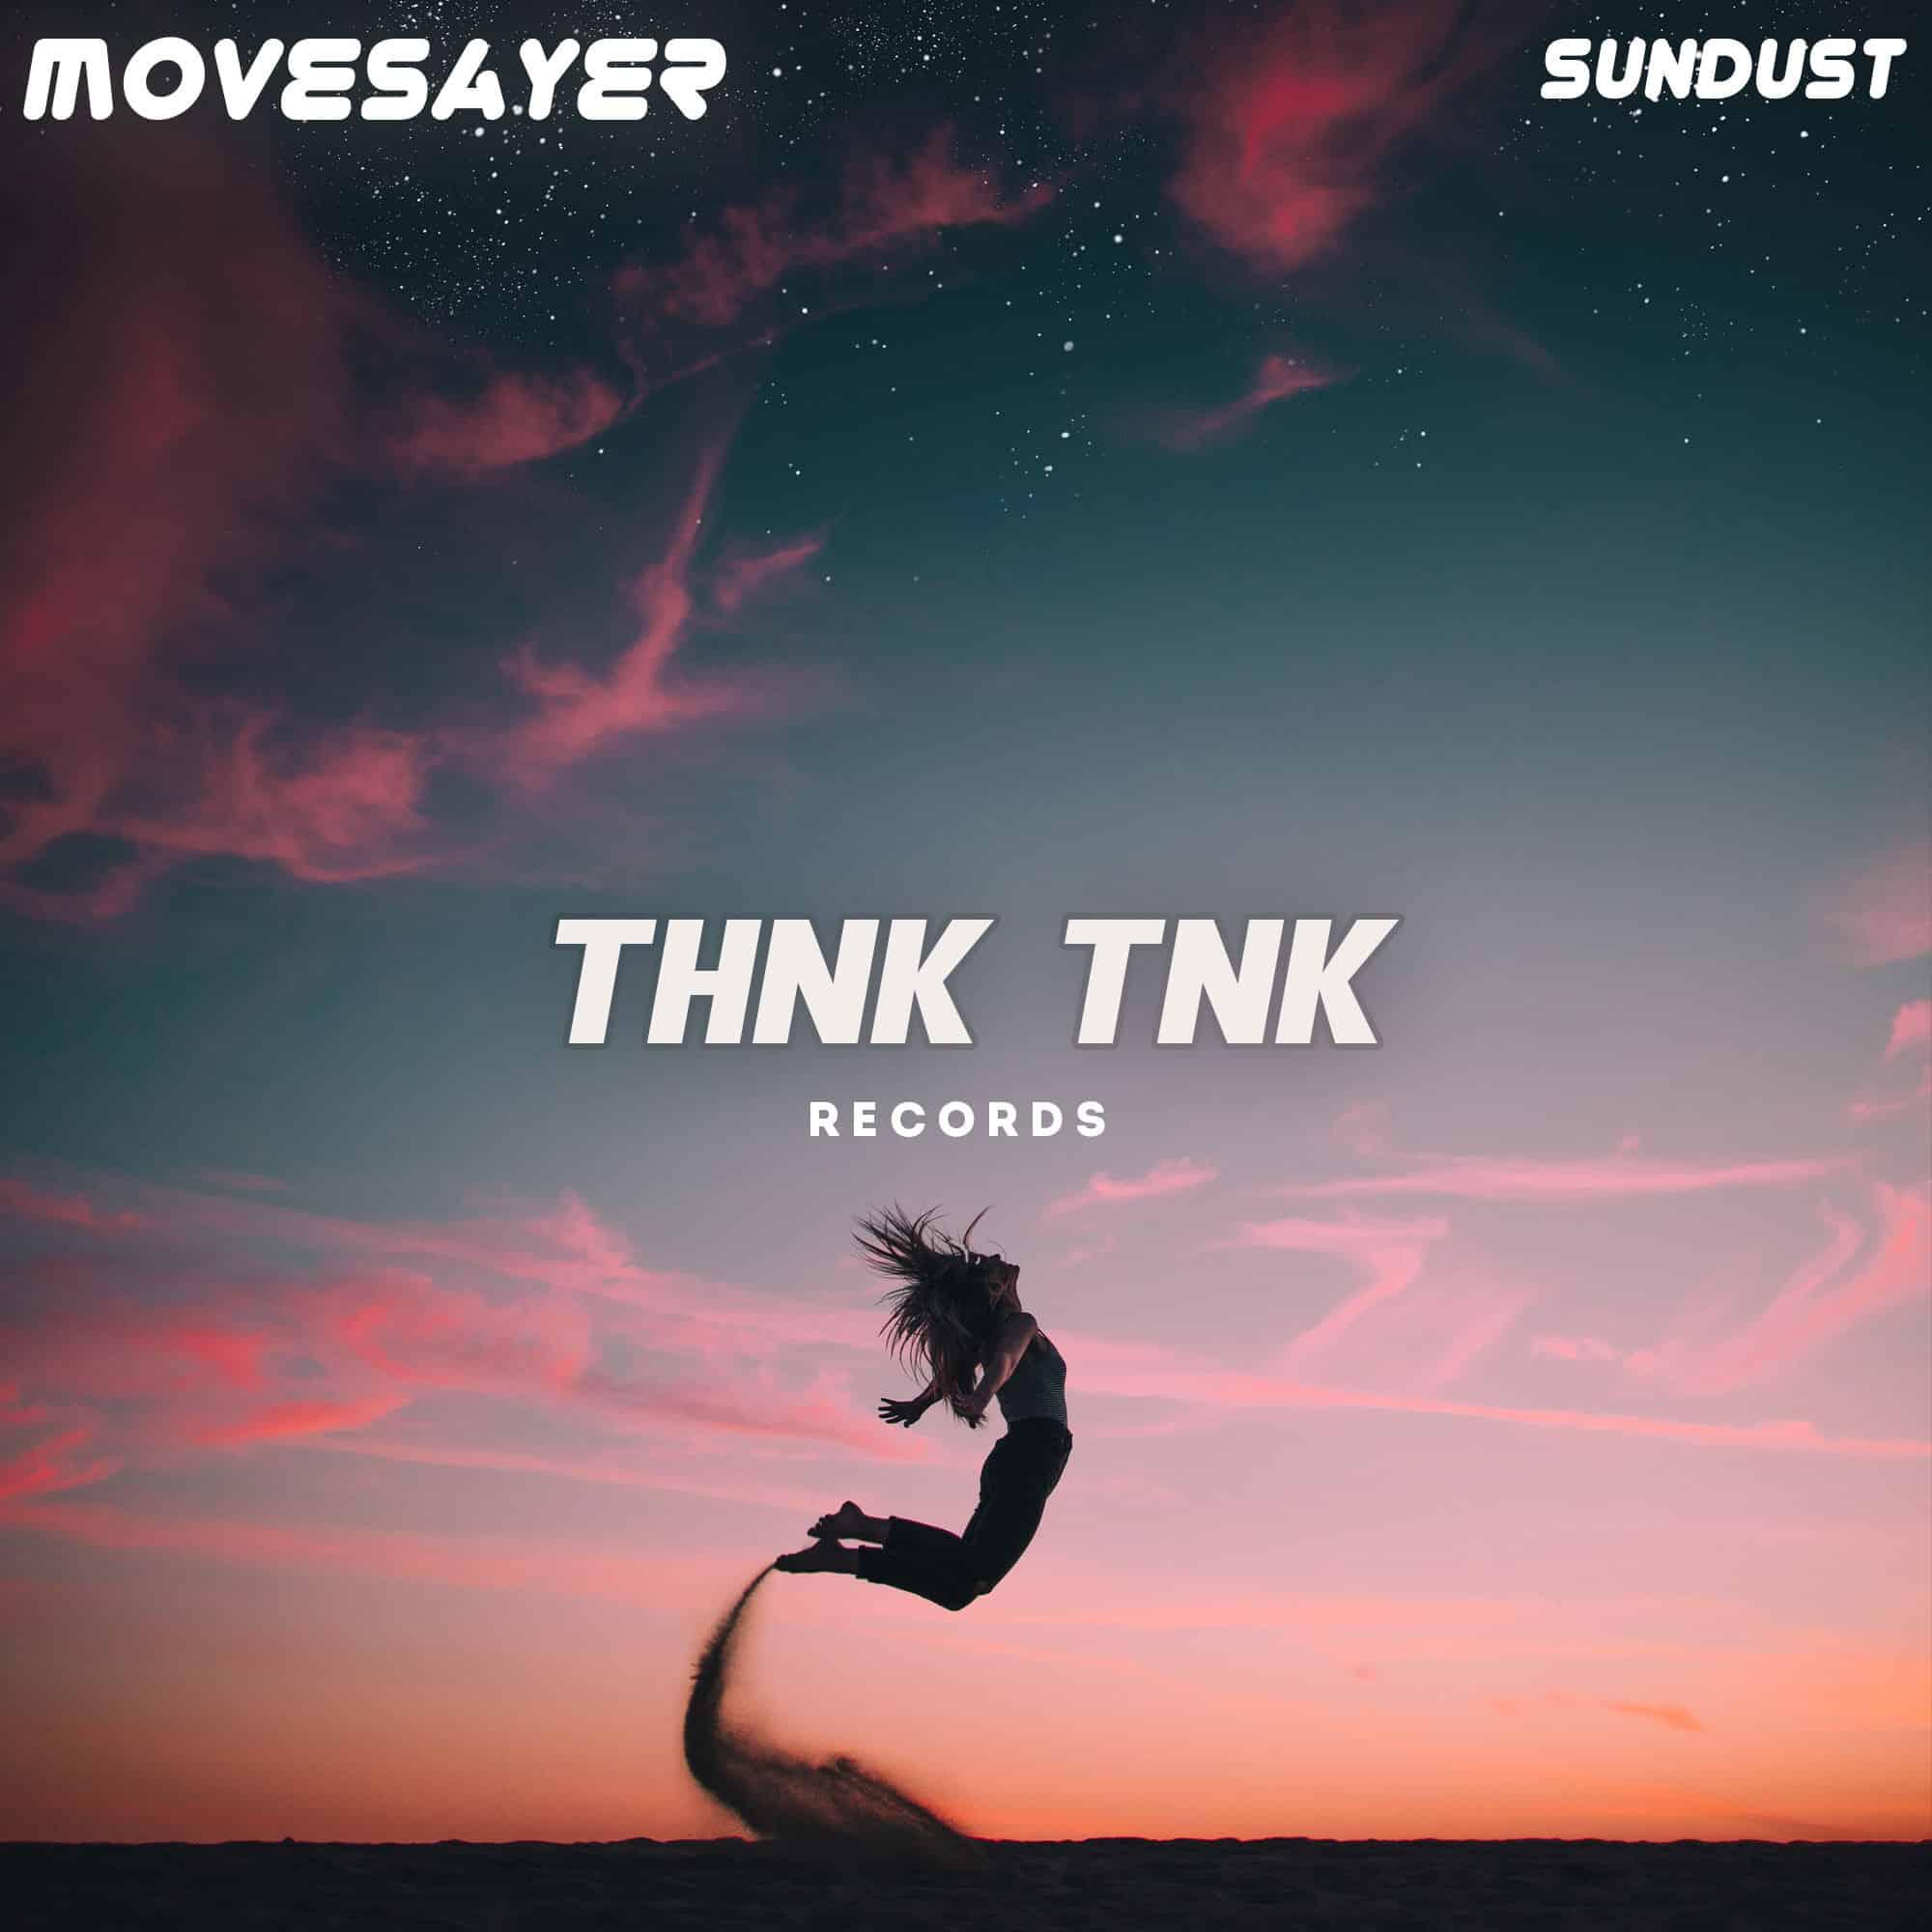 Movesayer - Sundust